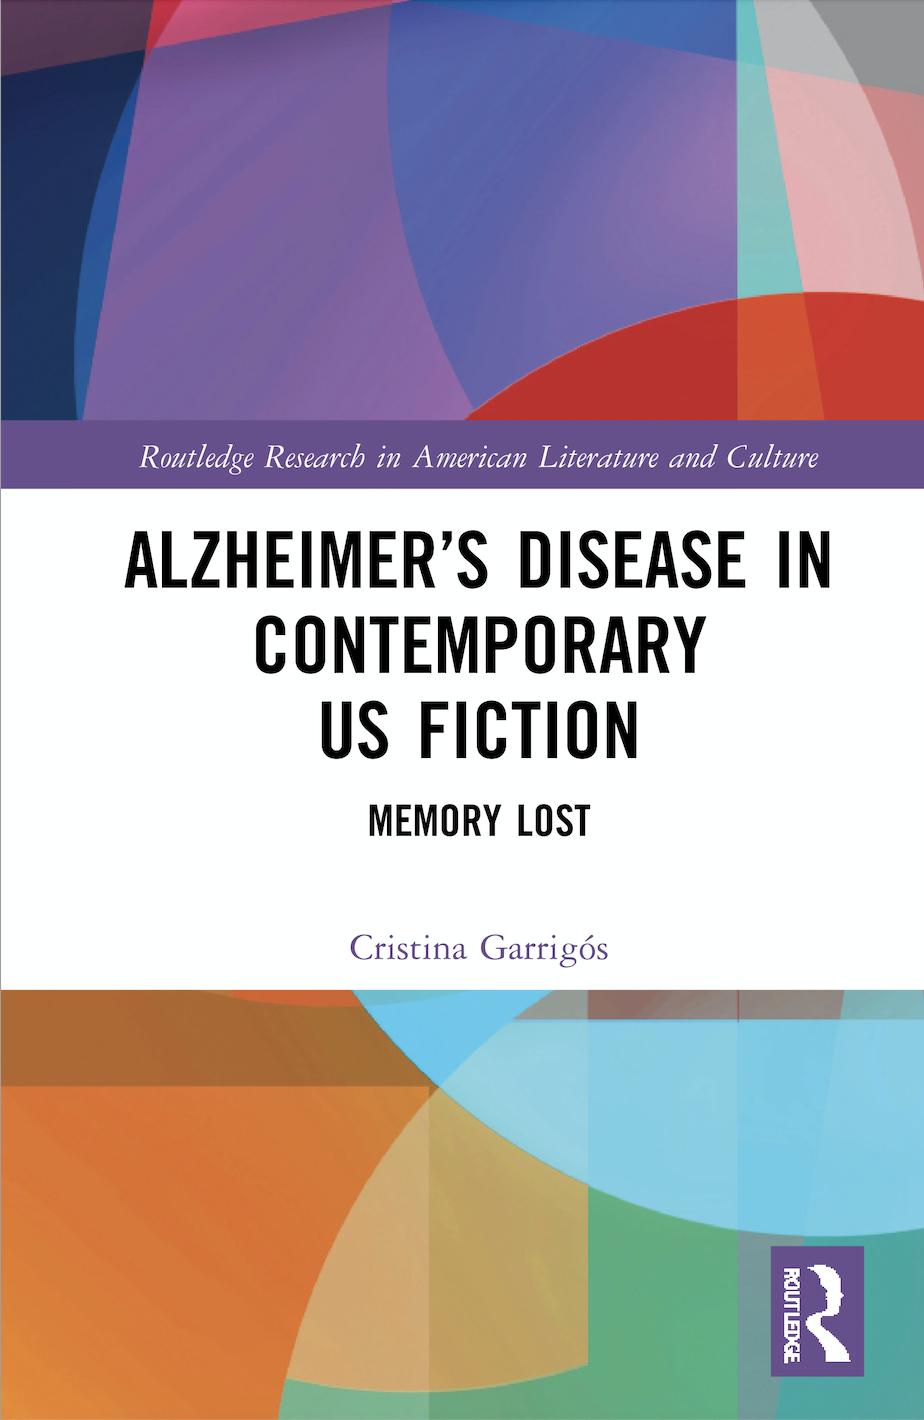 C.Garrigós.Alzheimer's Disease in Contemporary U.S. Fiction. Memory Lost